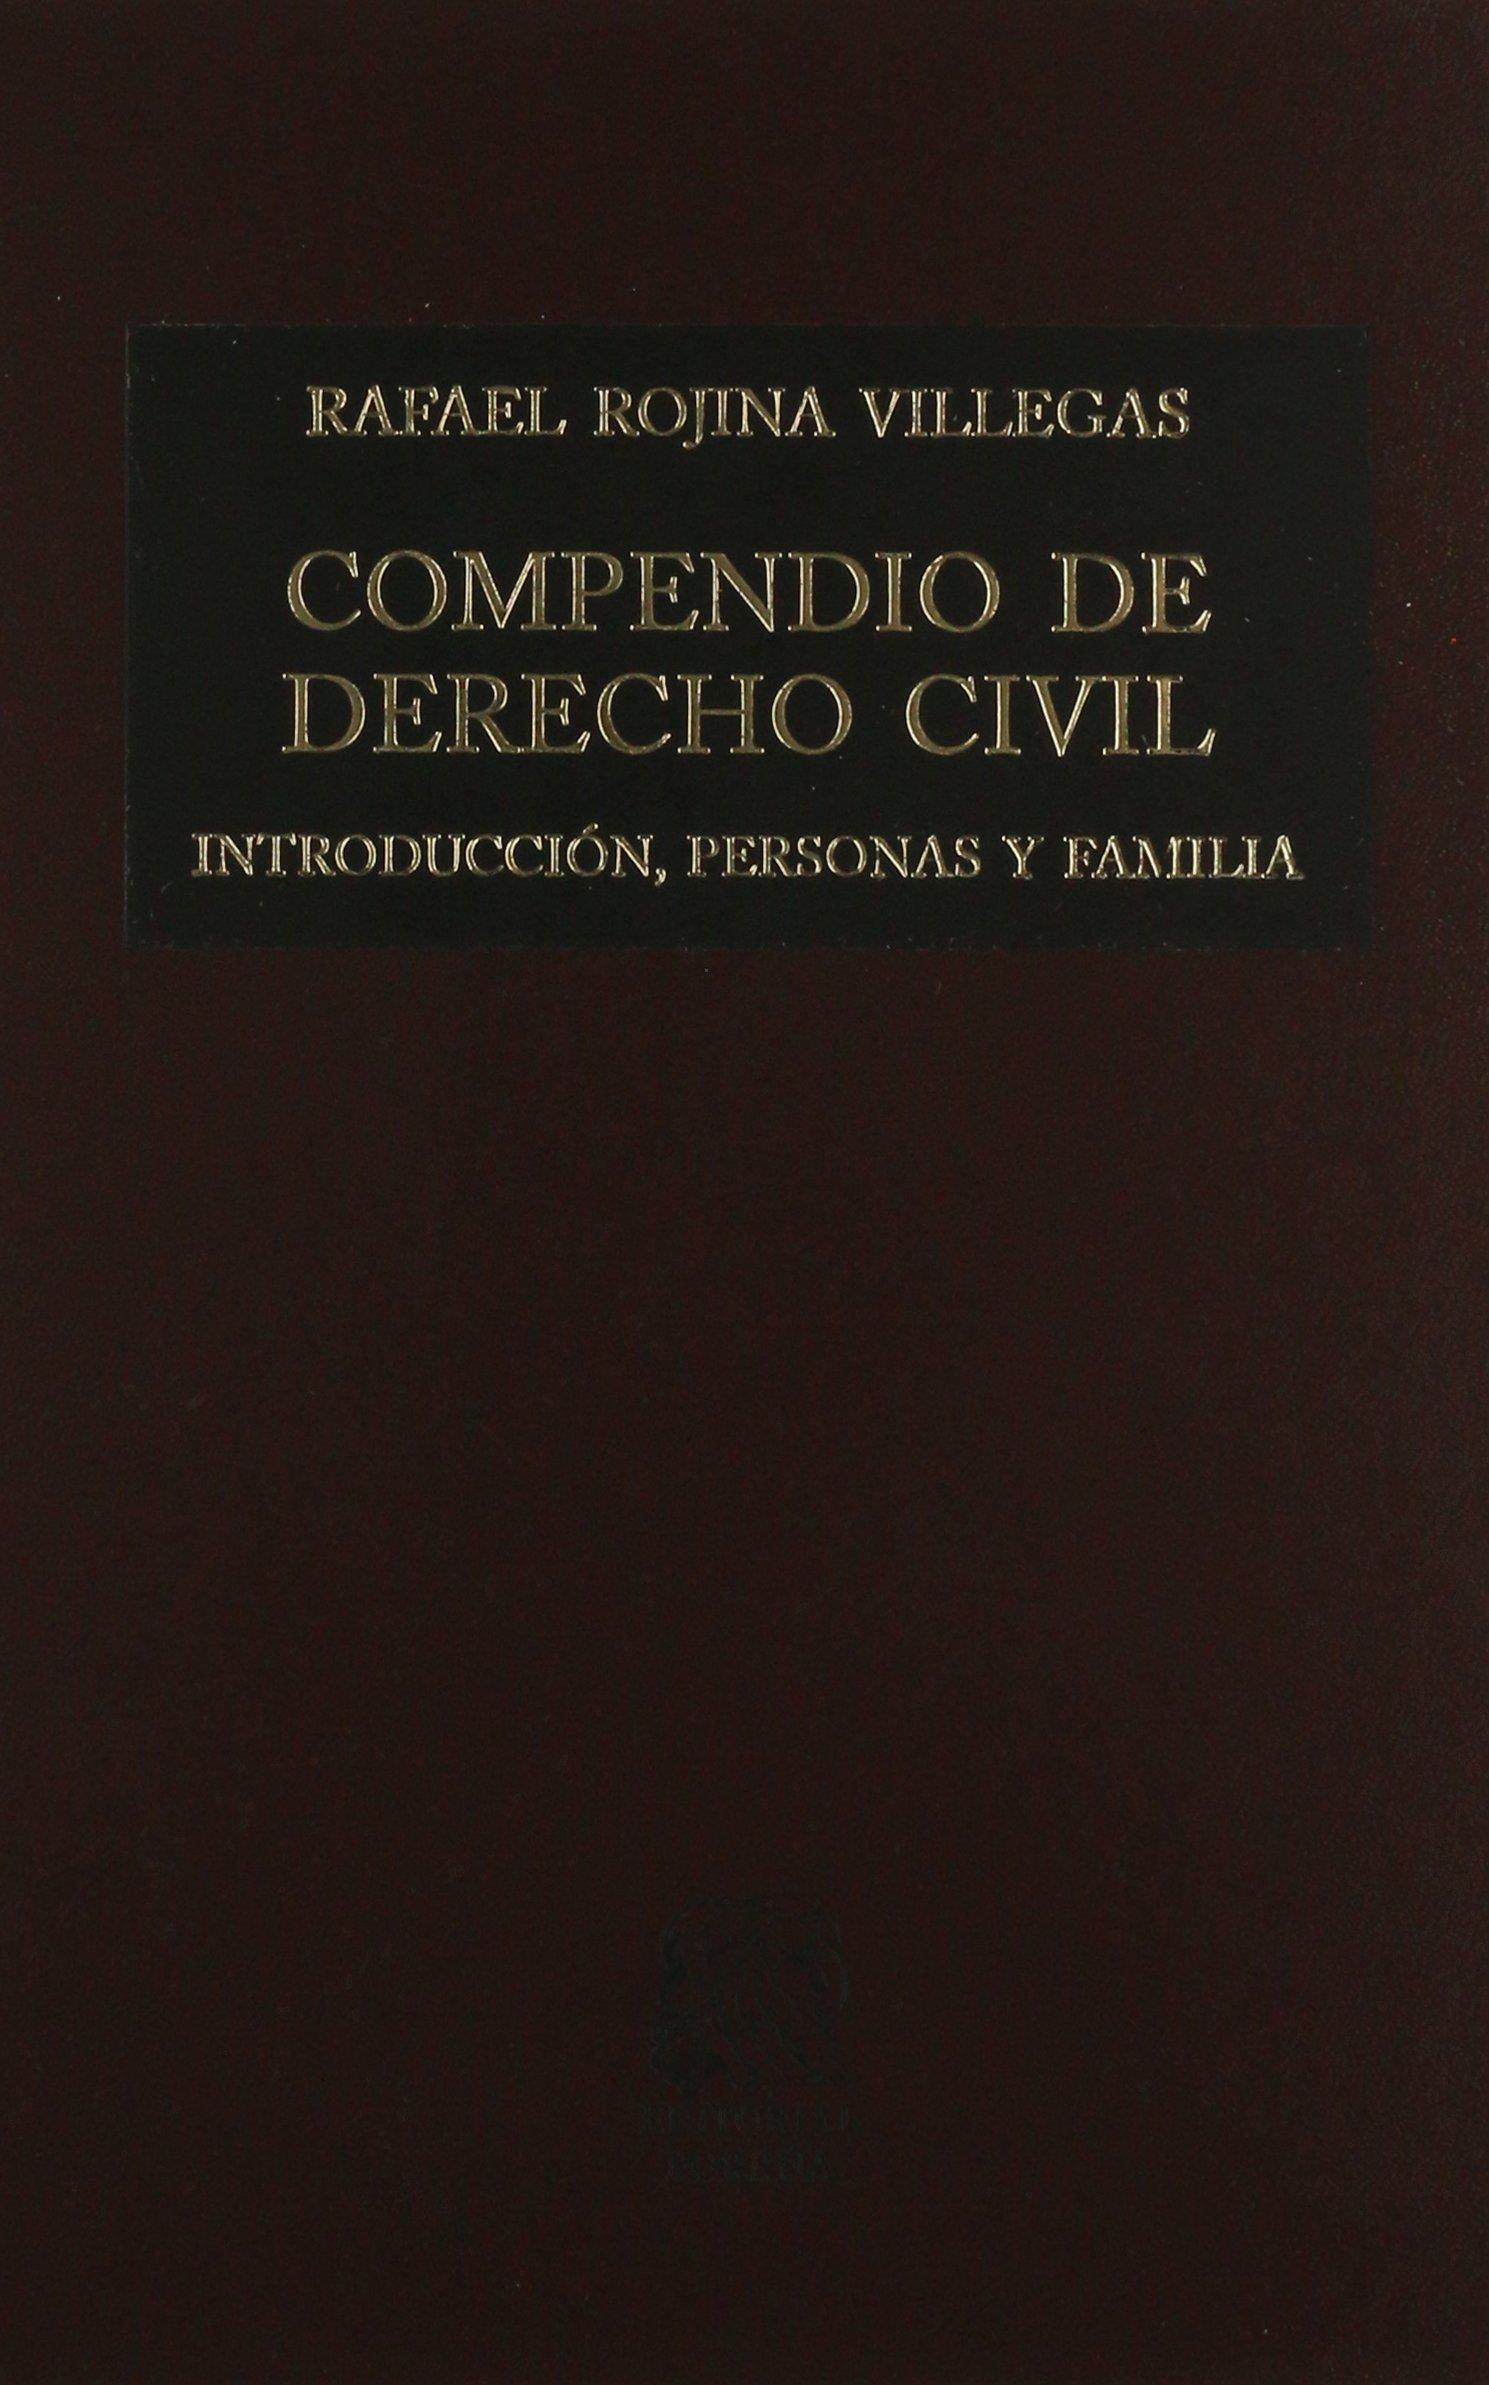 compendio de derecho civil rafael rojina villegas